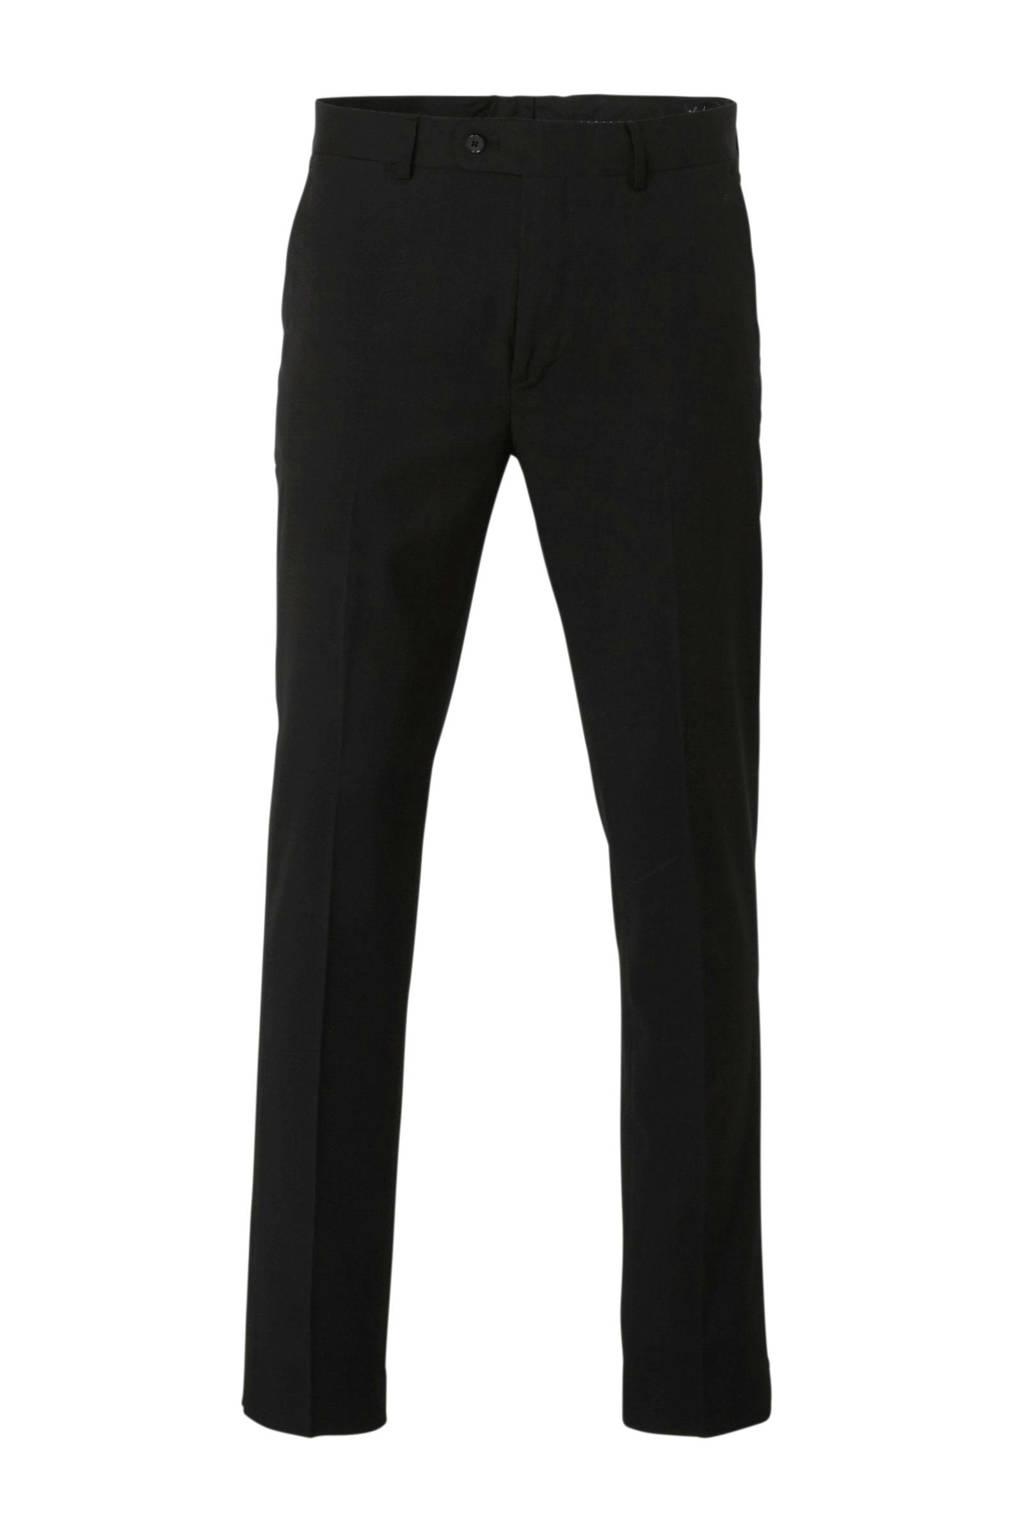 Mango Man slim fit pantalon zwart, Zwart